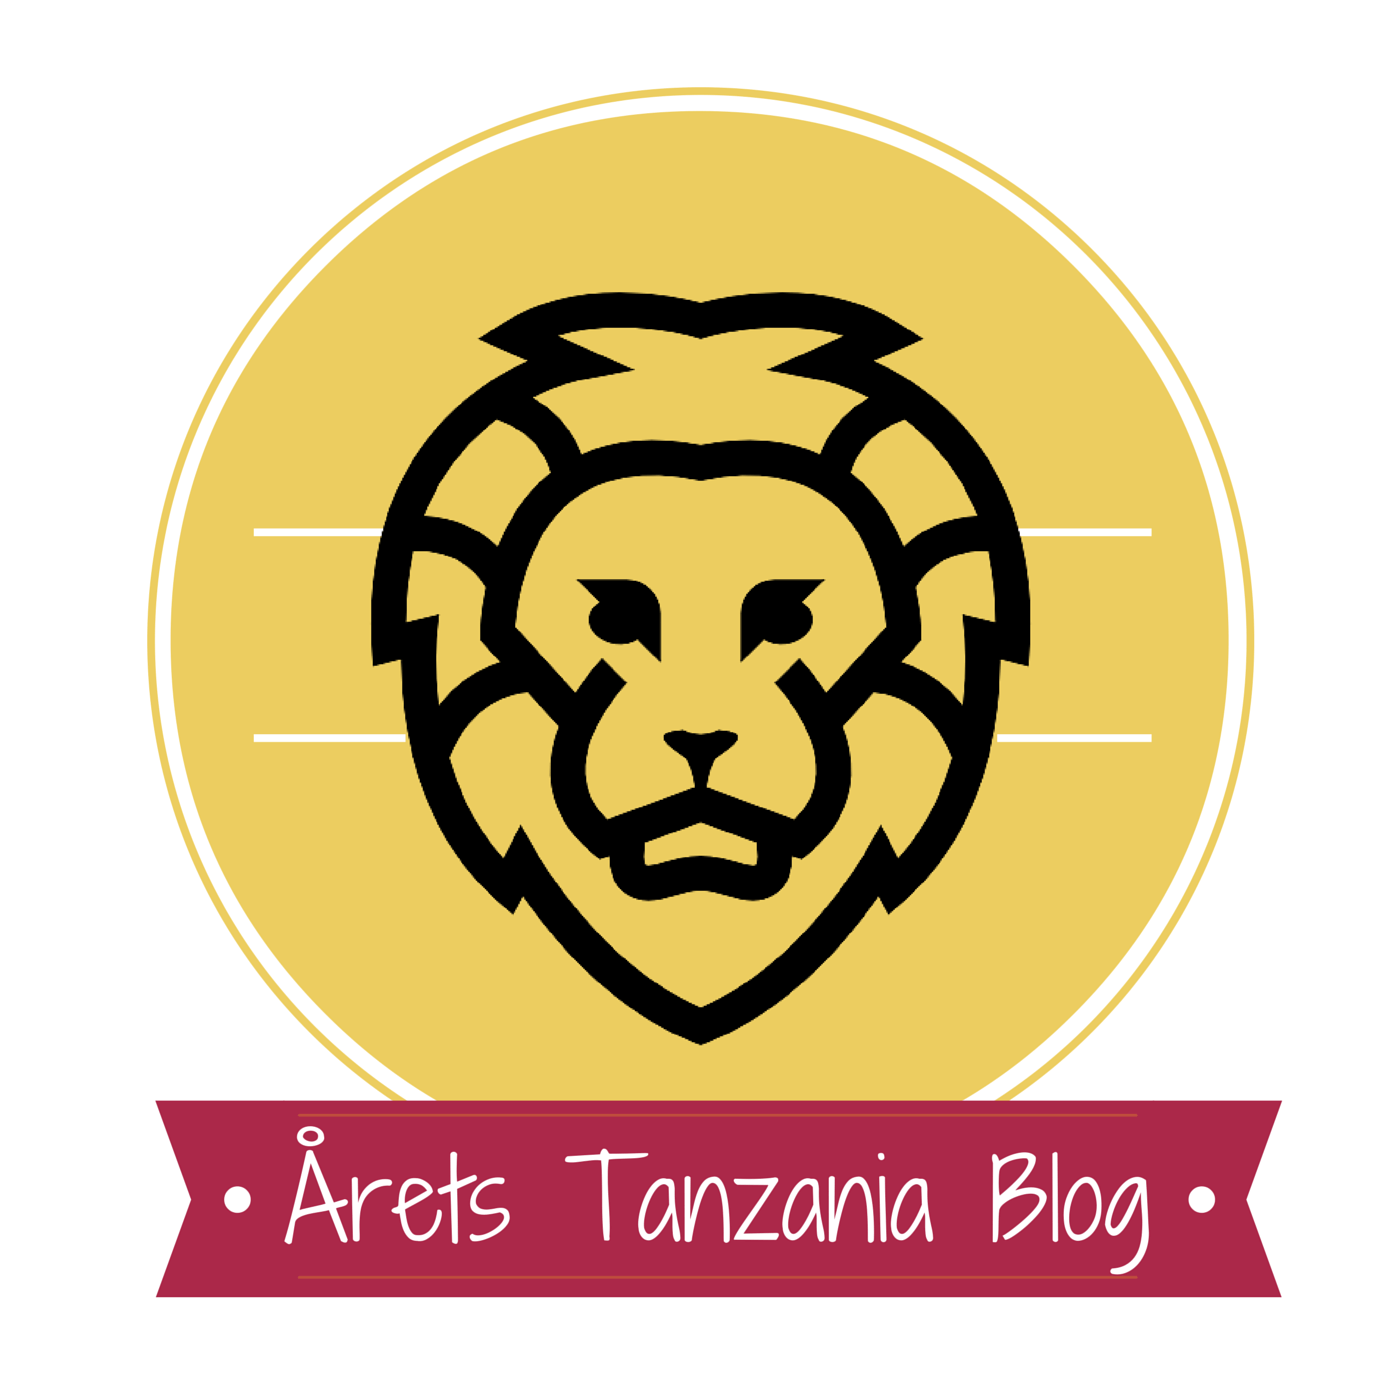 Årets_Tanzania_Blog_logo